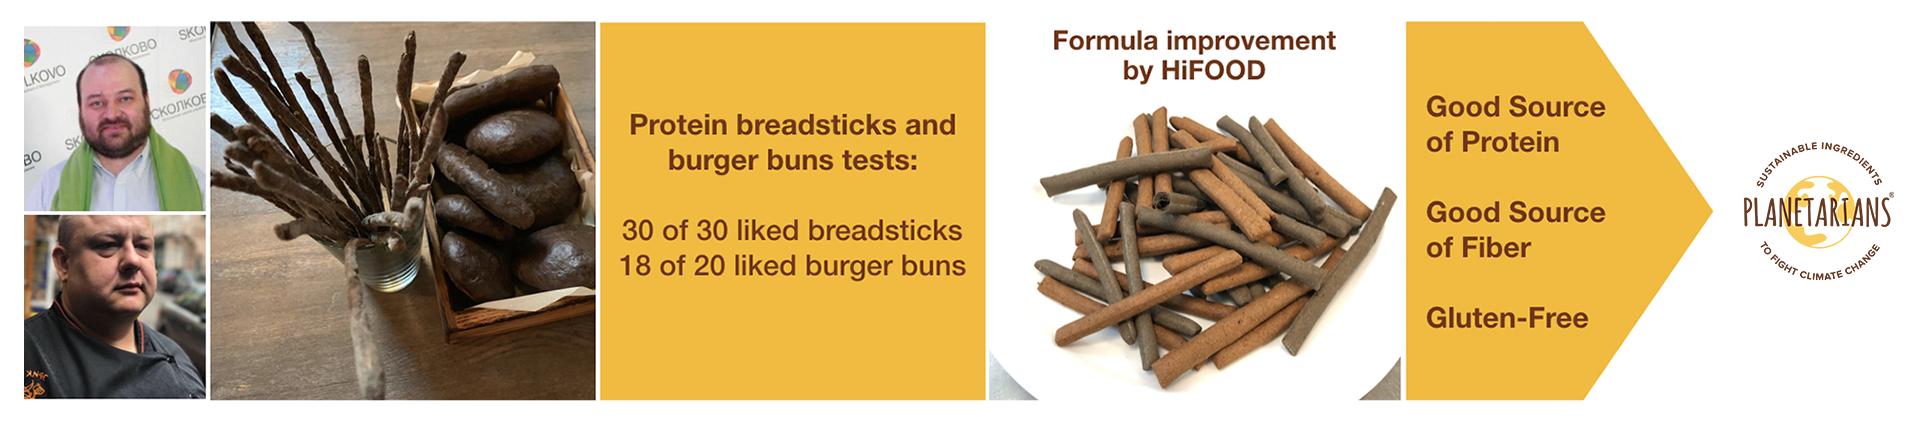 Breadsticks+development.png